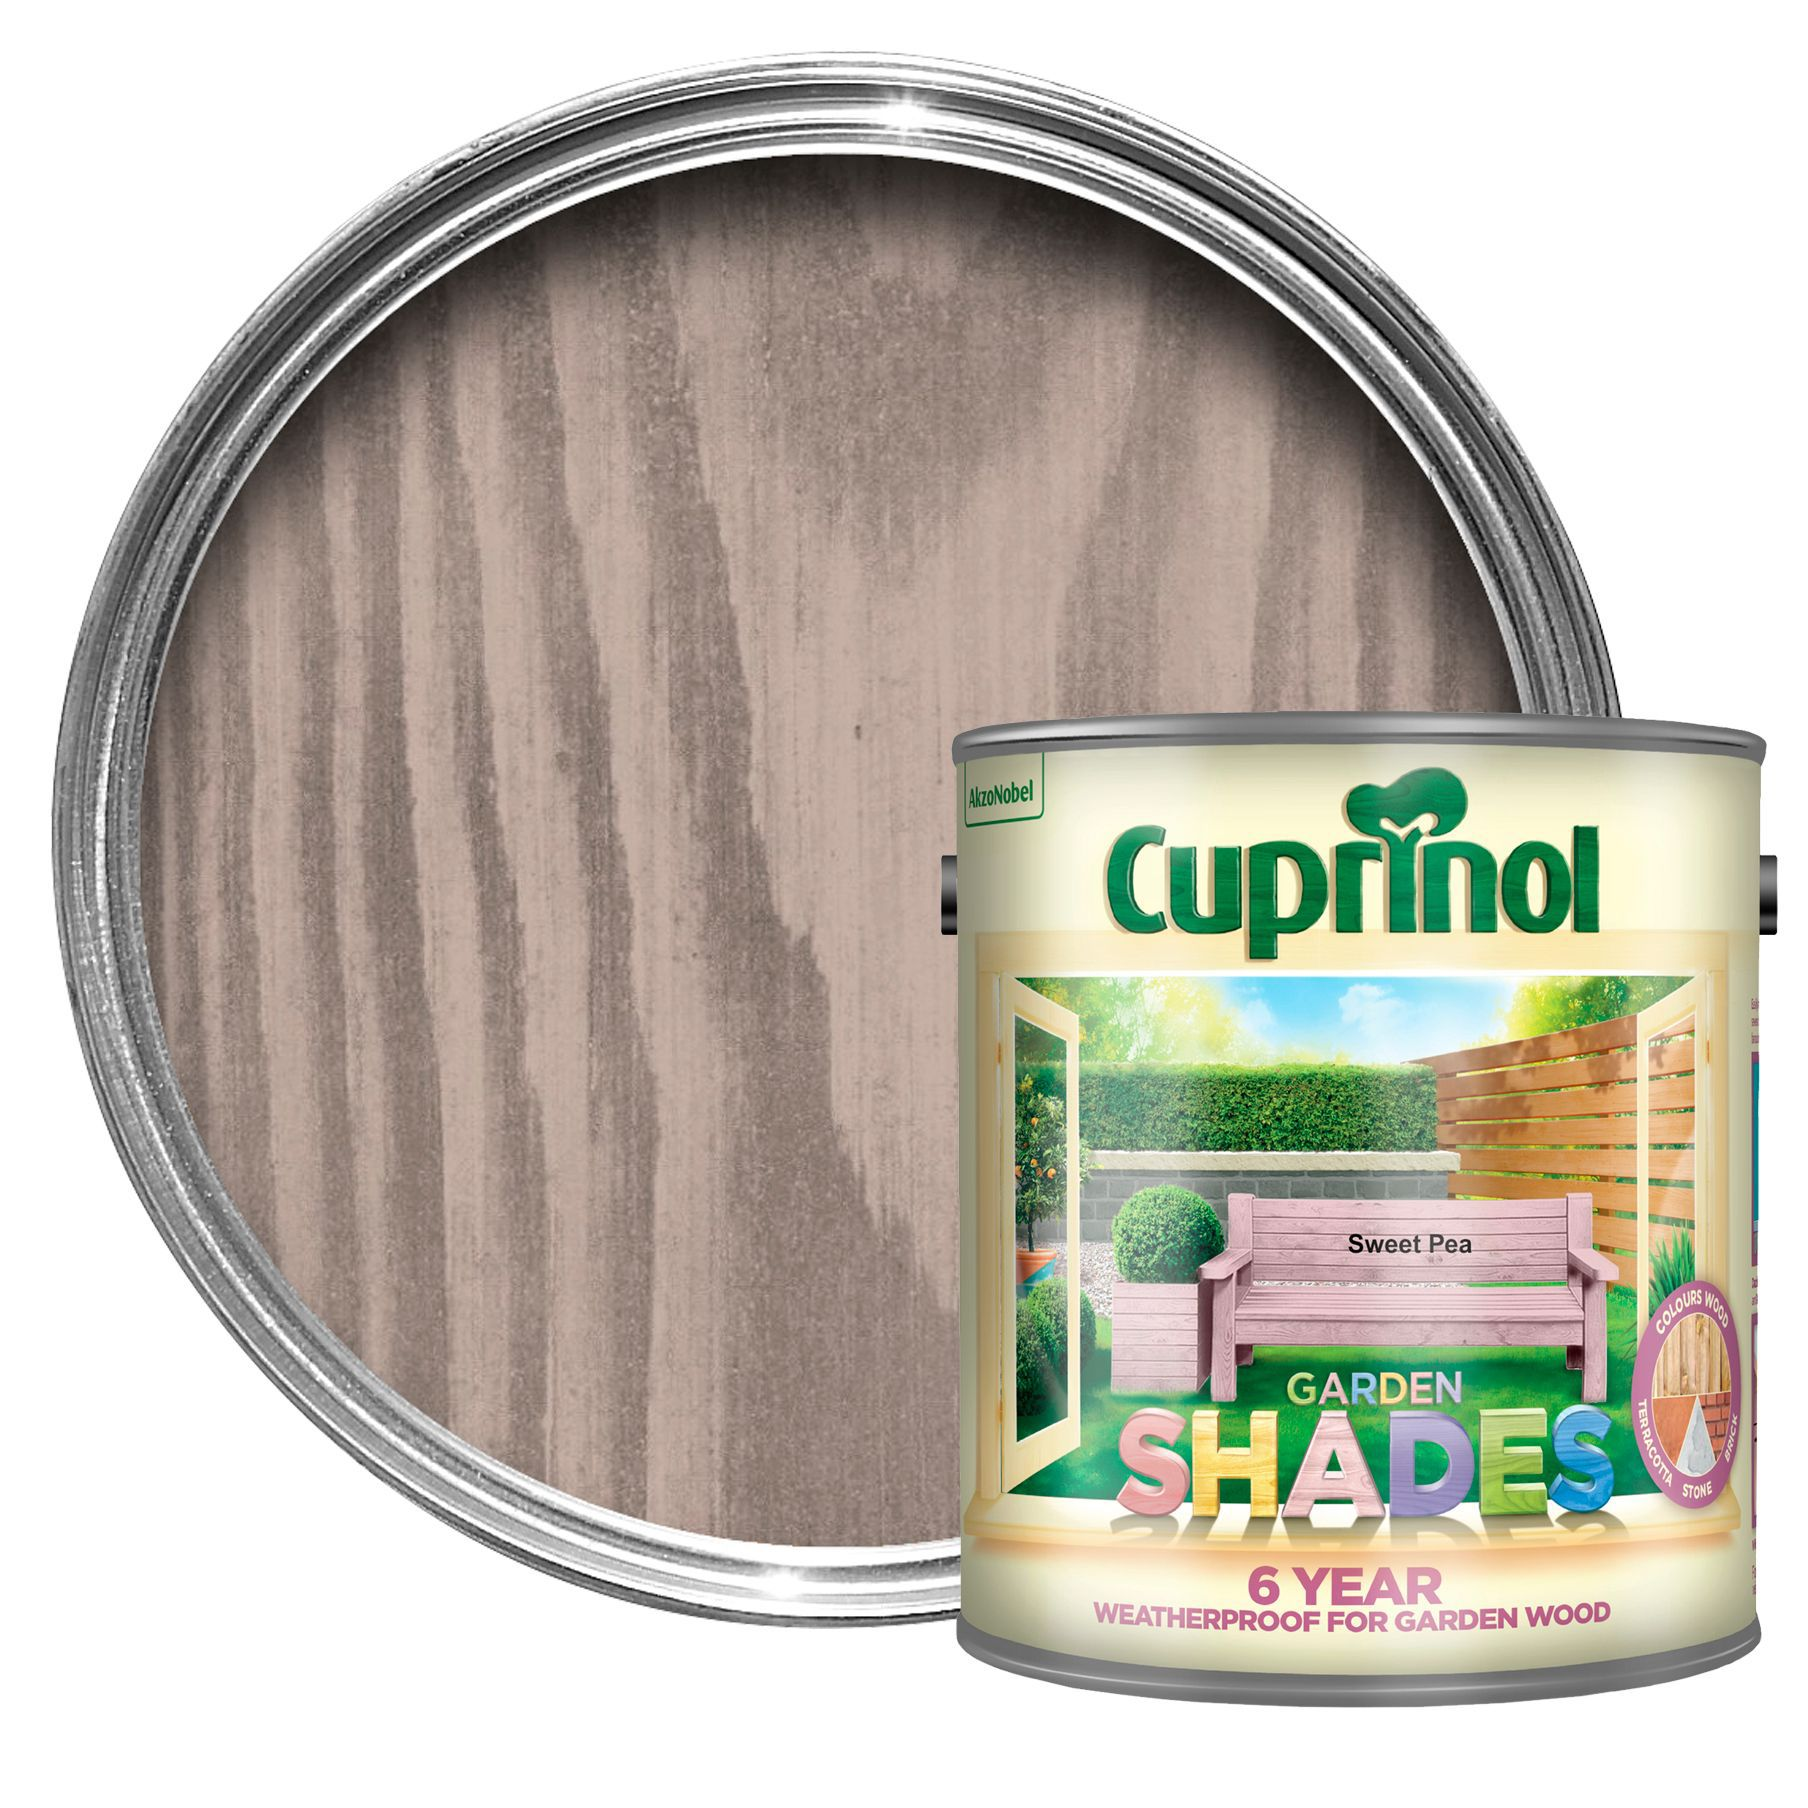 Cuprinol Garden Shades Sweet Pea Matt Wood Paint 2.5l